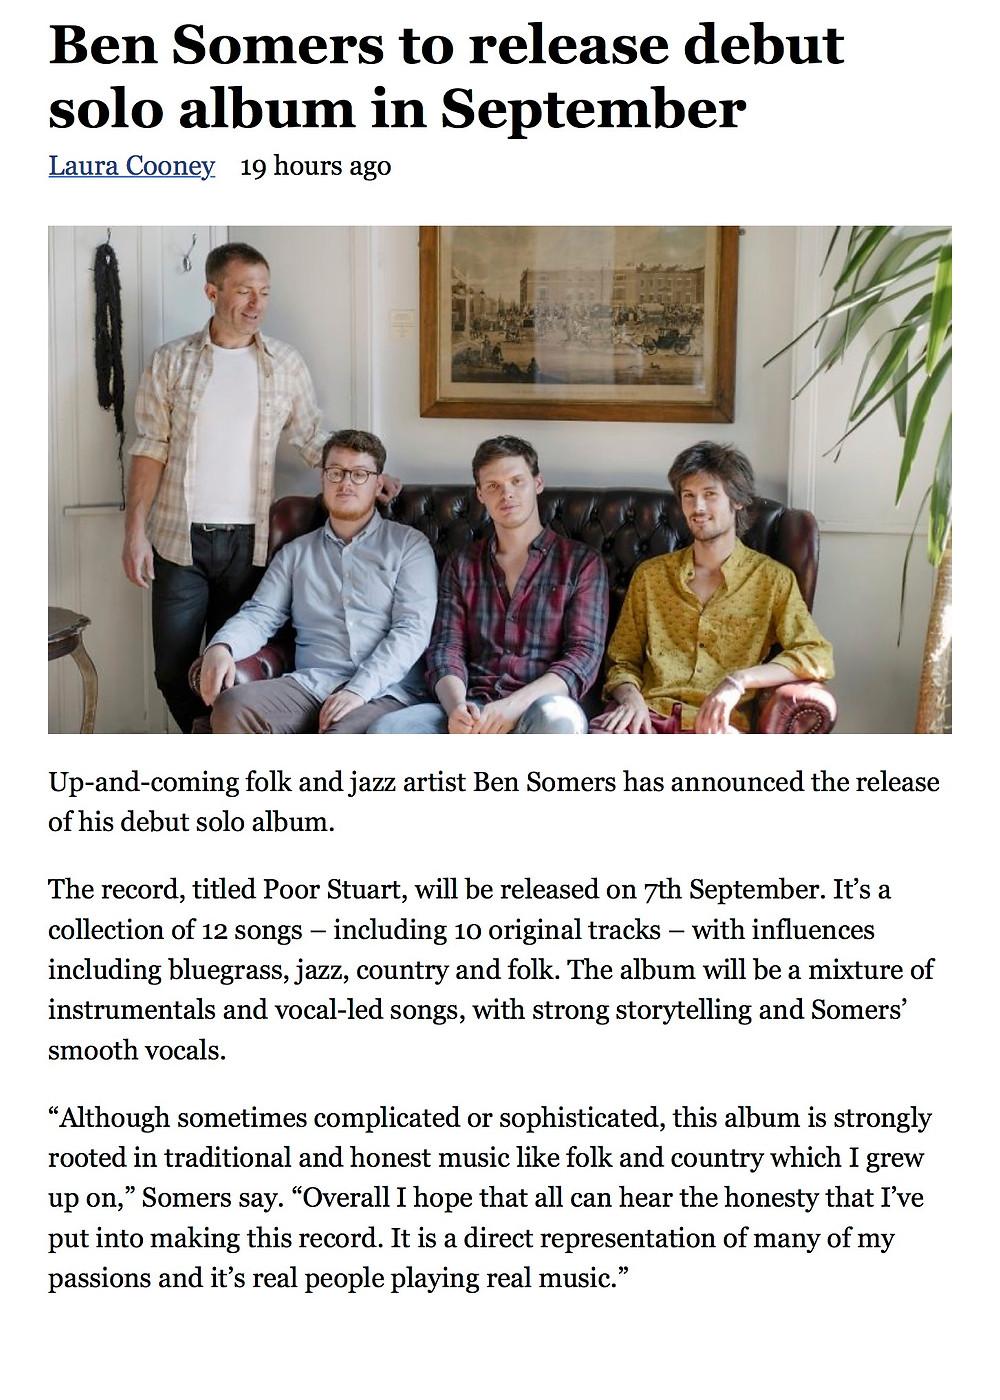 Ben Somers to release debut solo album in September - Entertainment Focus copy.jpg